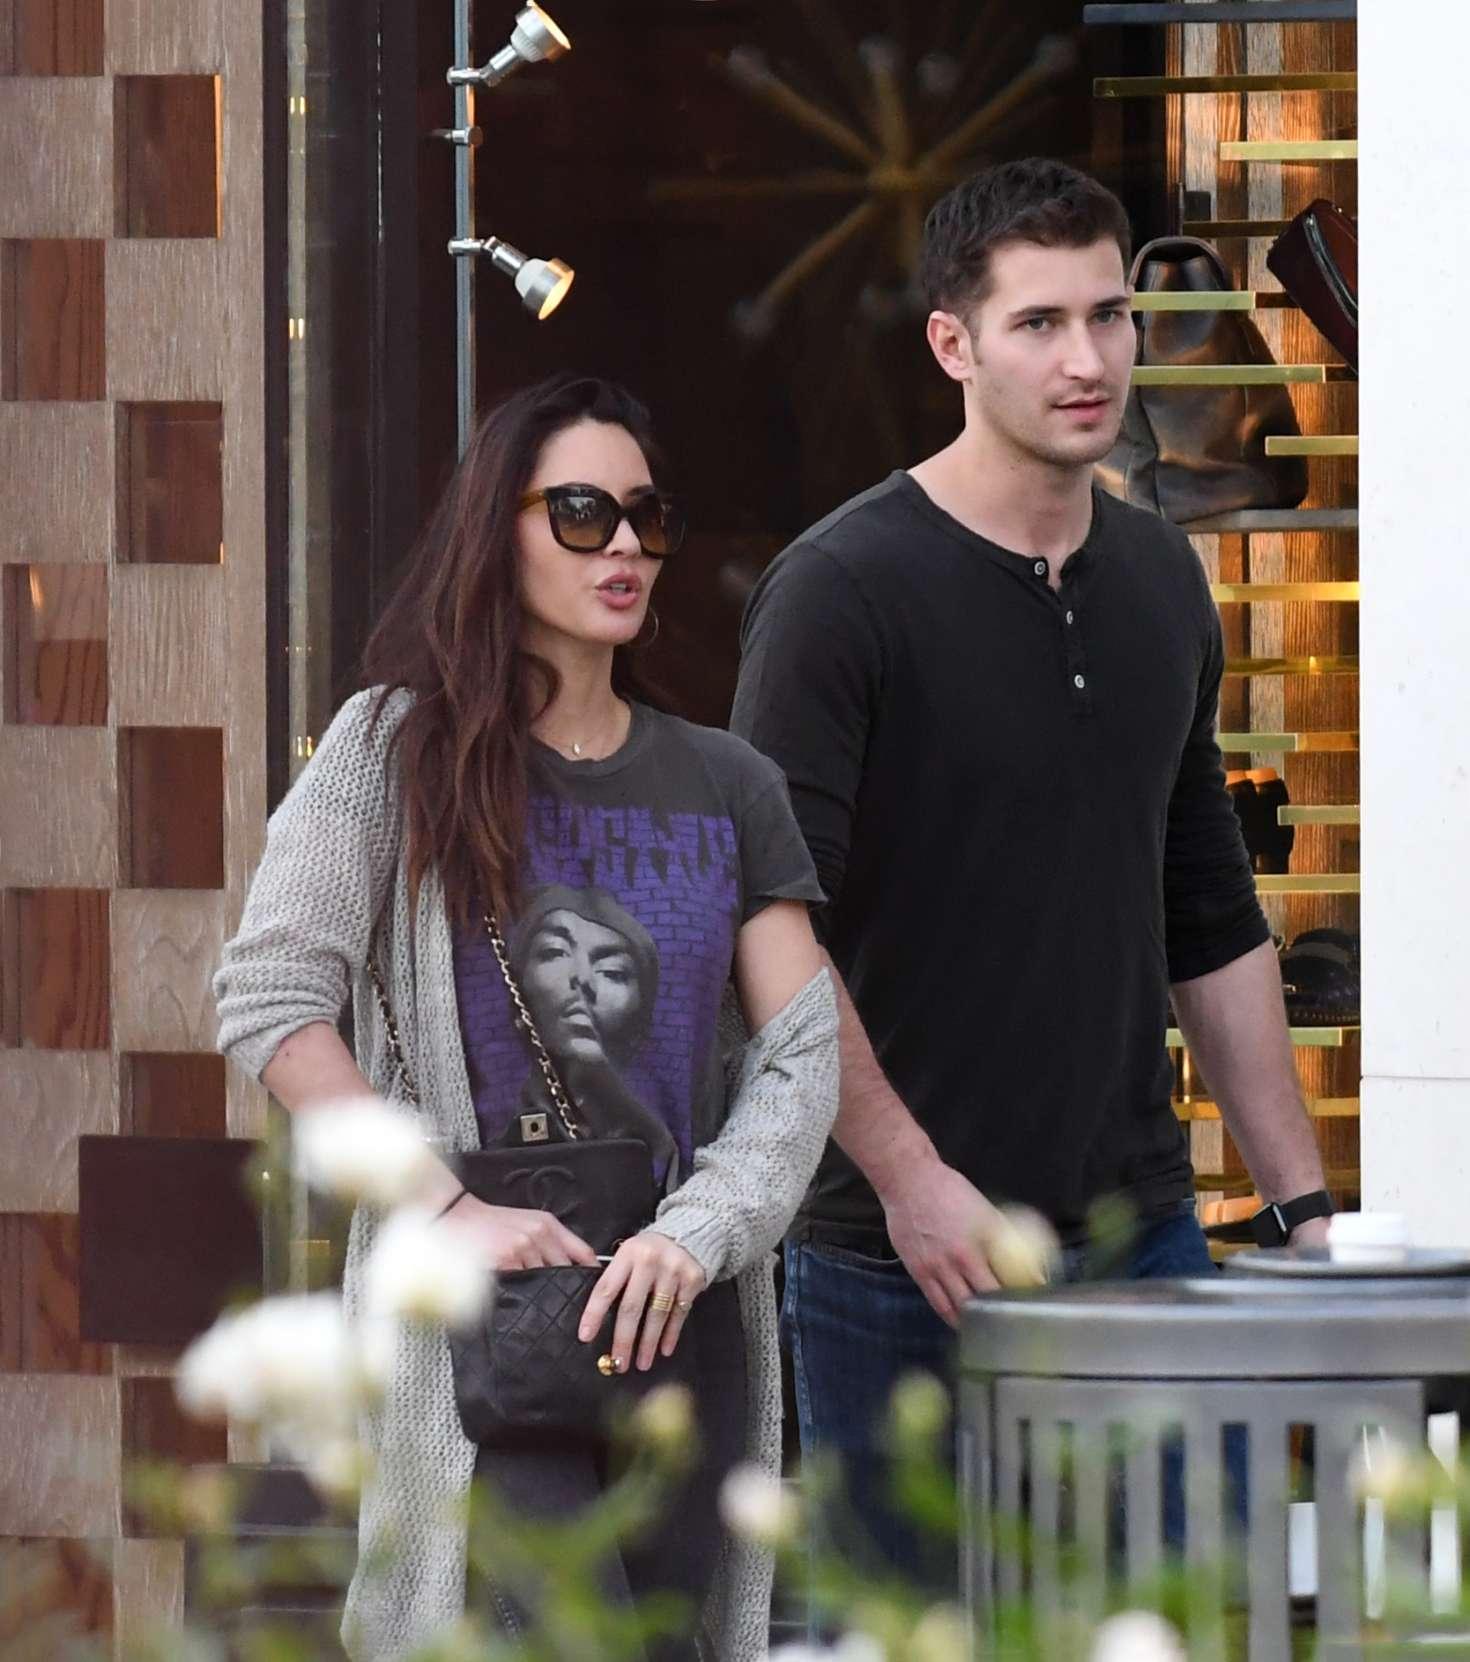 Olivia Munn with boyfriend - Shopping in Los Angeles